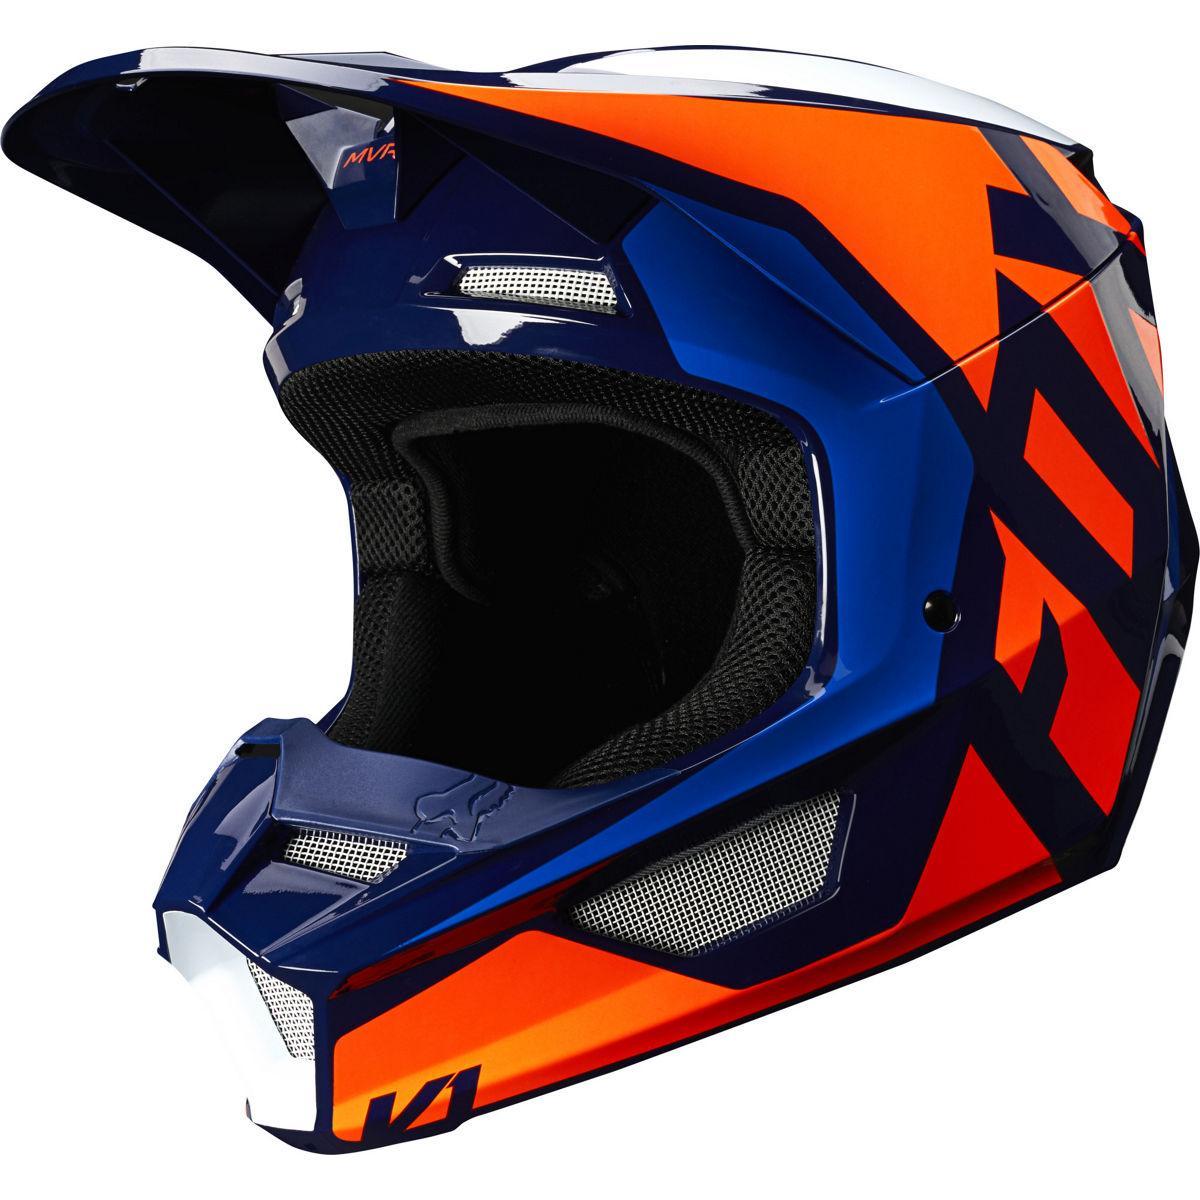 Мотошлем Fox V1 PRIX Helmet оранжевый/синий, XS